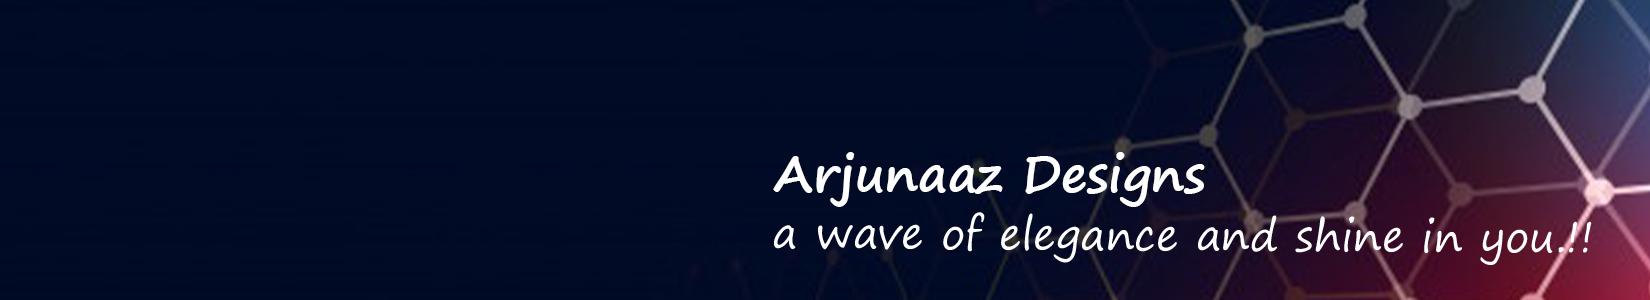 Arjunaaz Designs